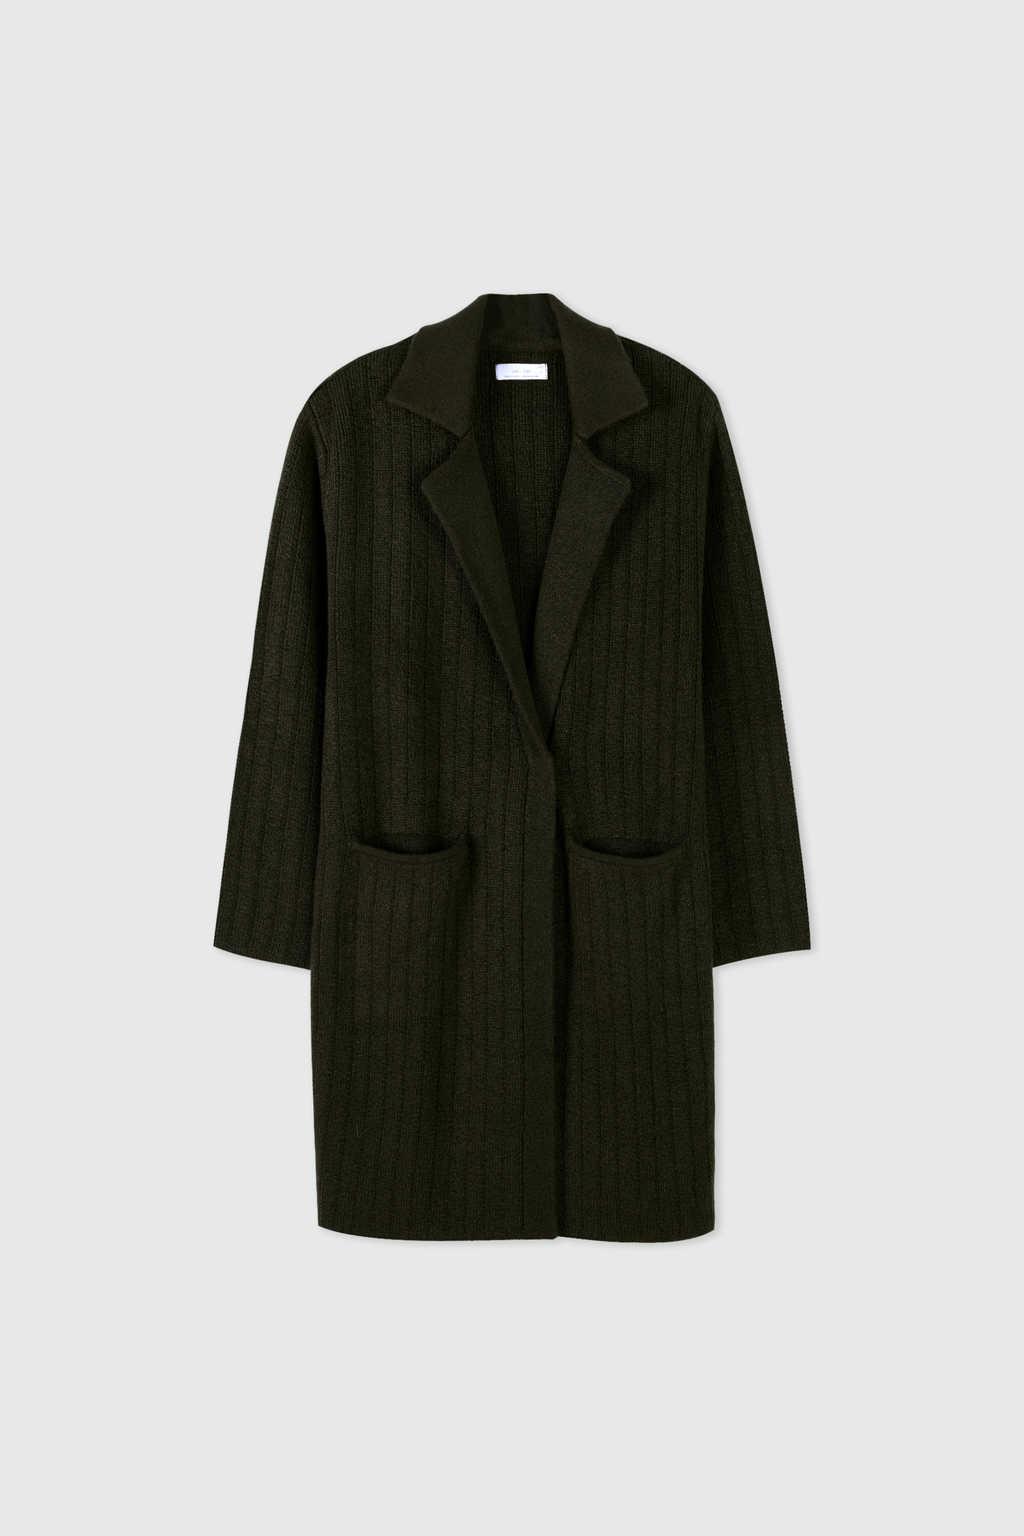 Cardigan 2600 Olive 7